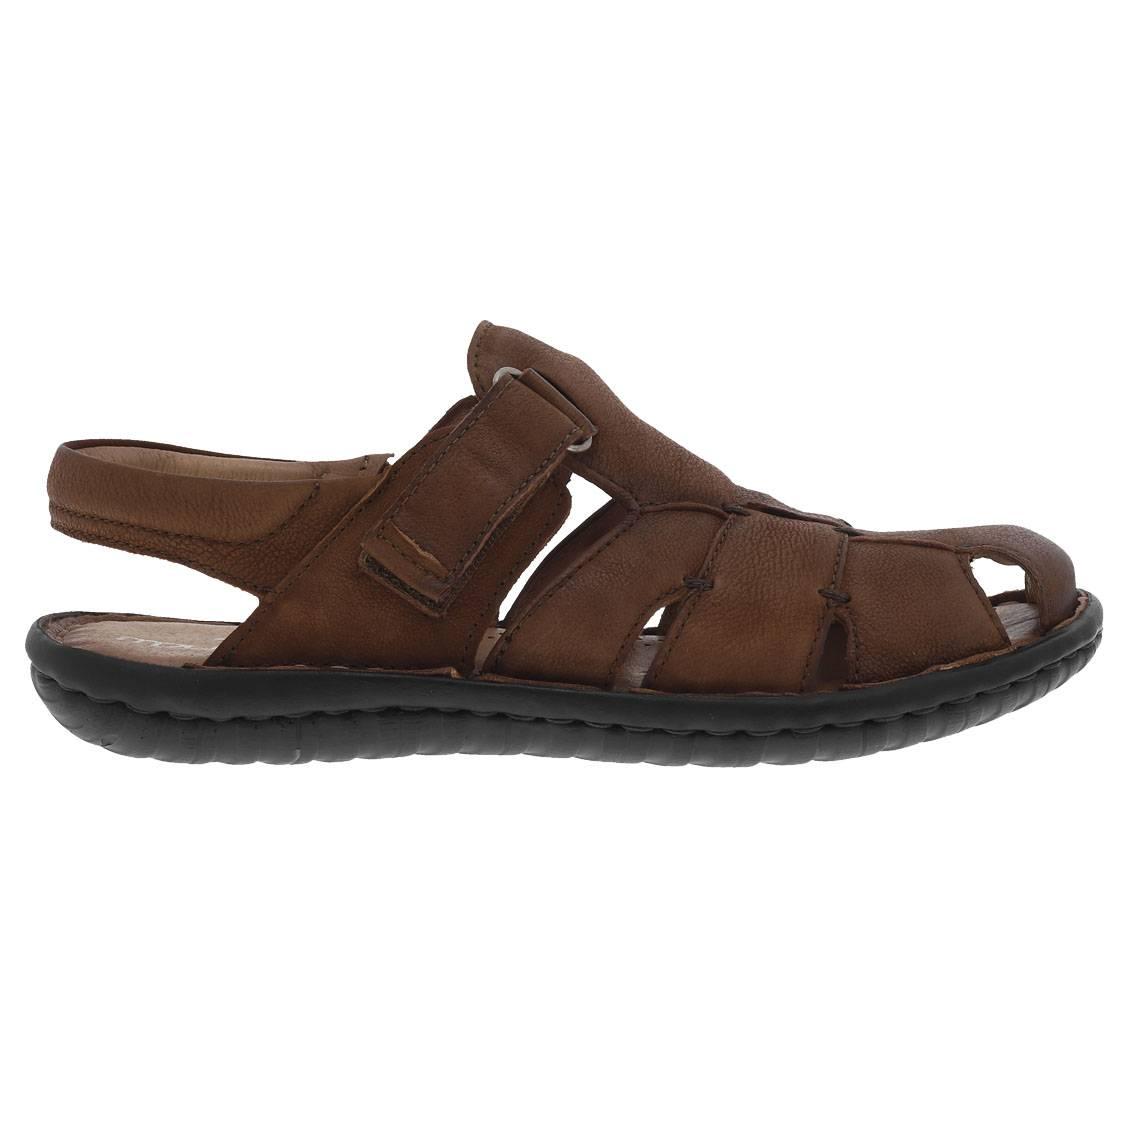 Sandales  en cuir véritable marron